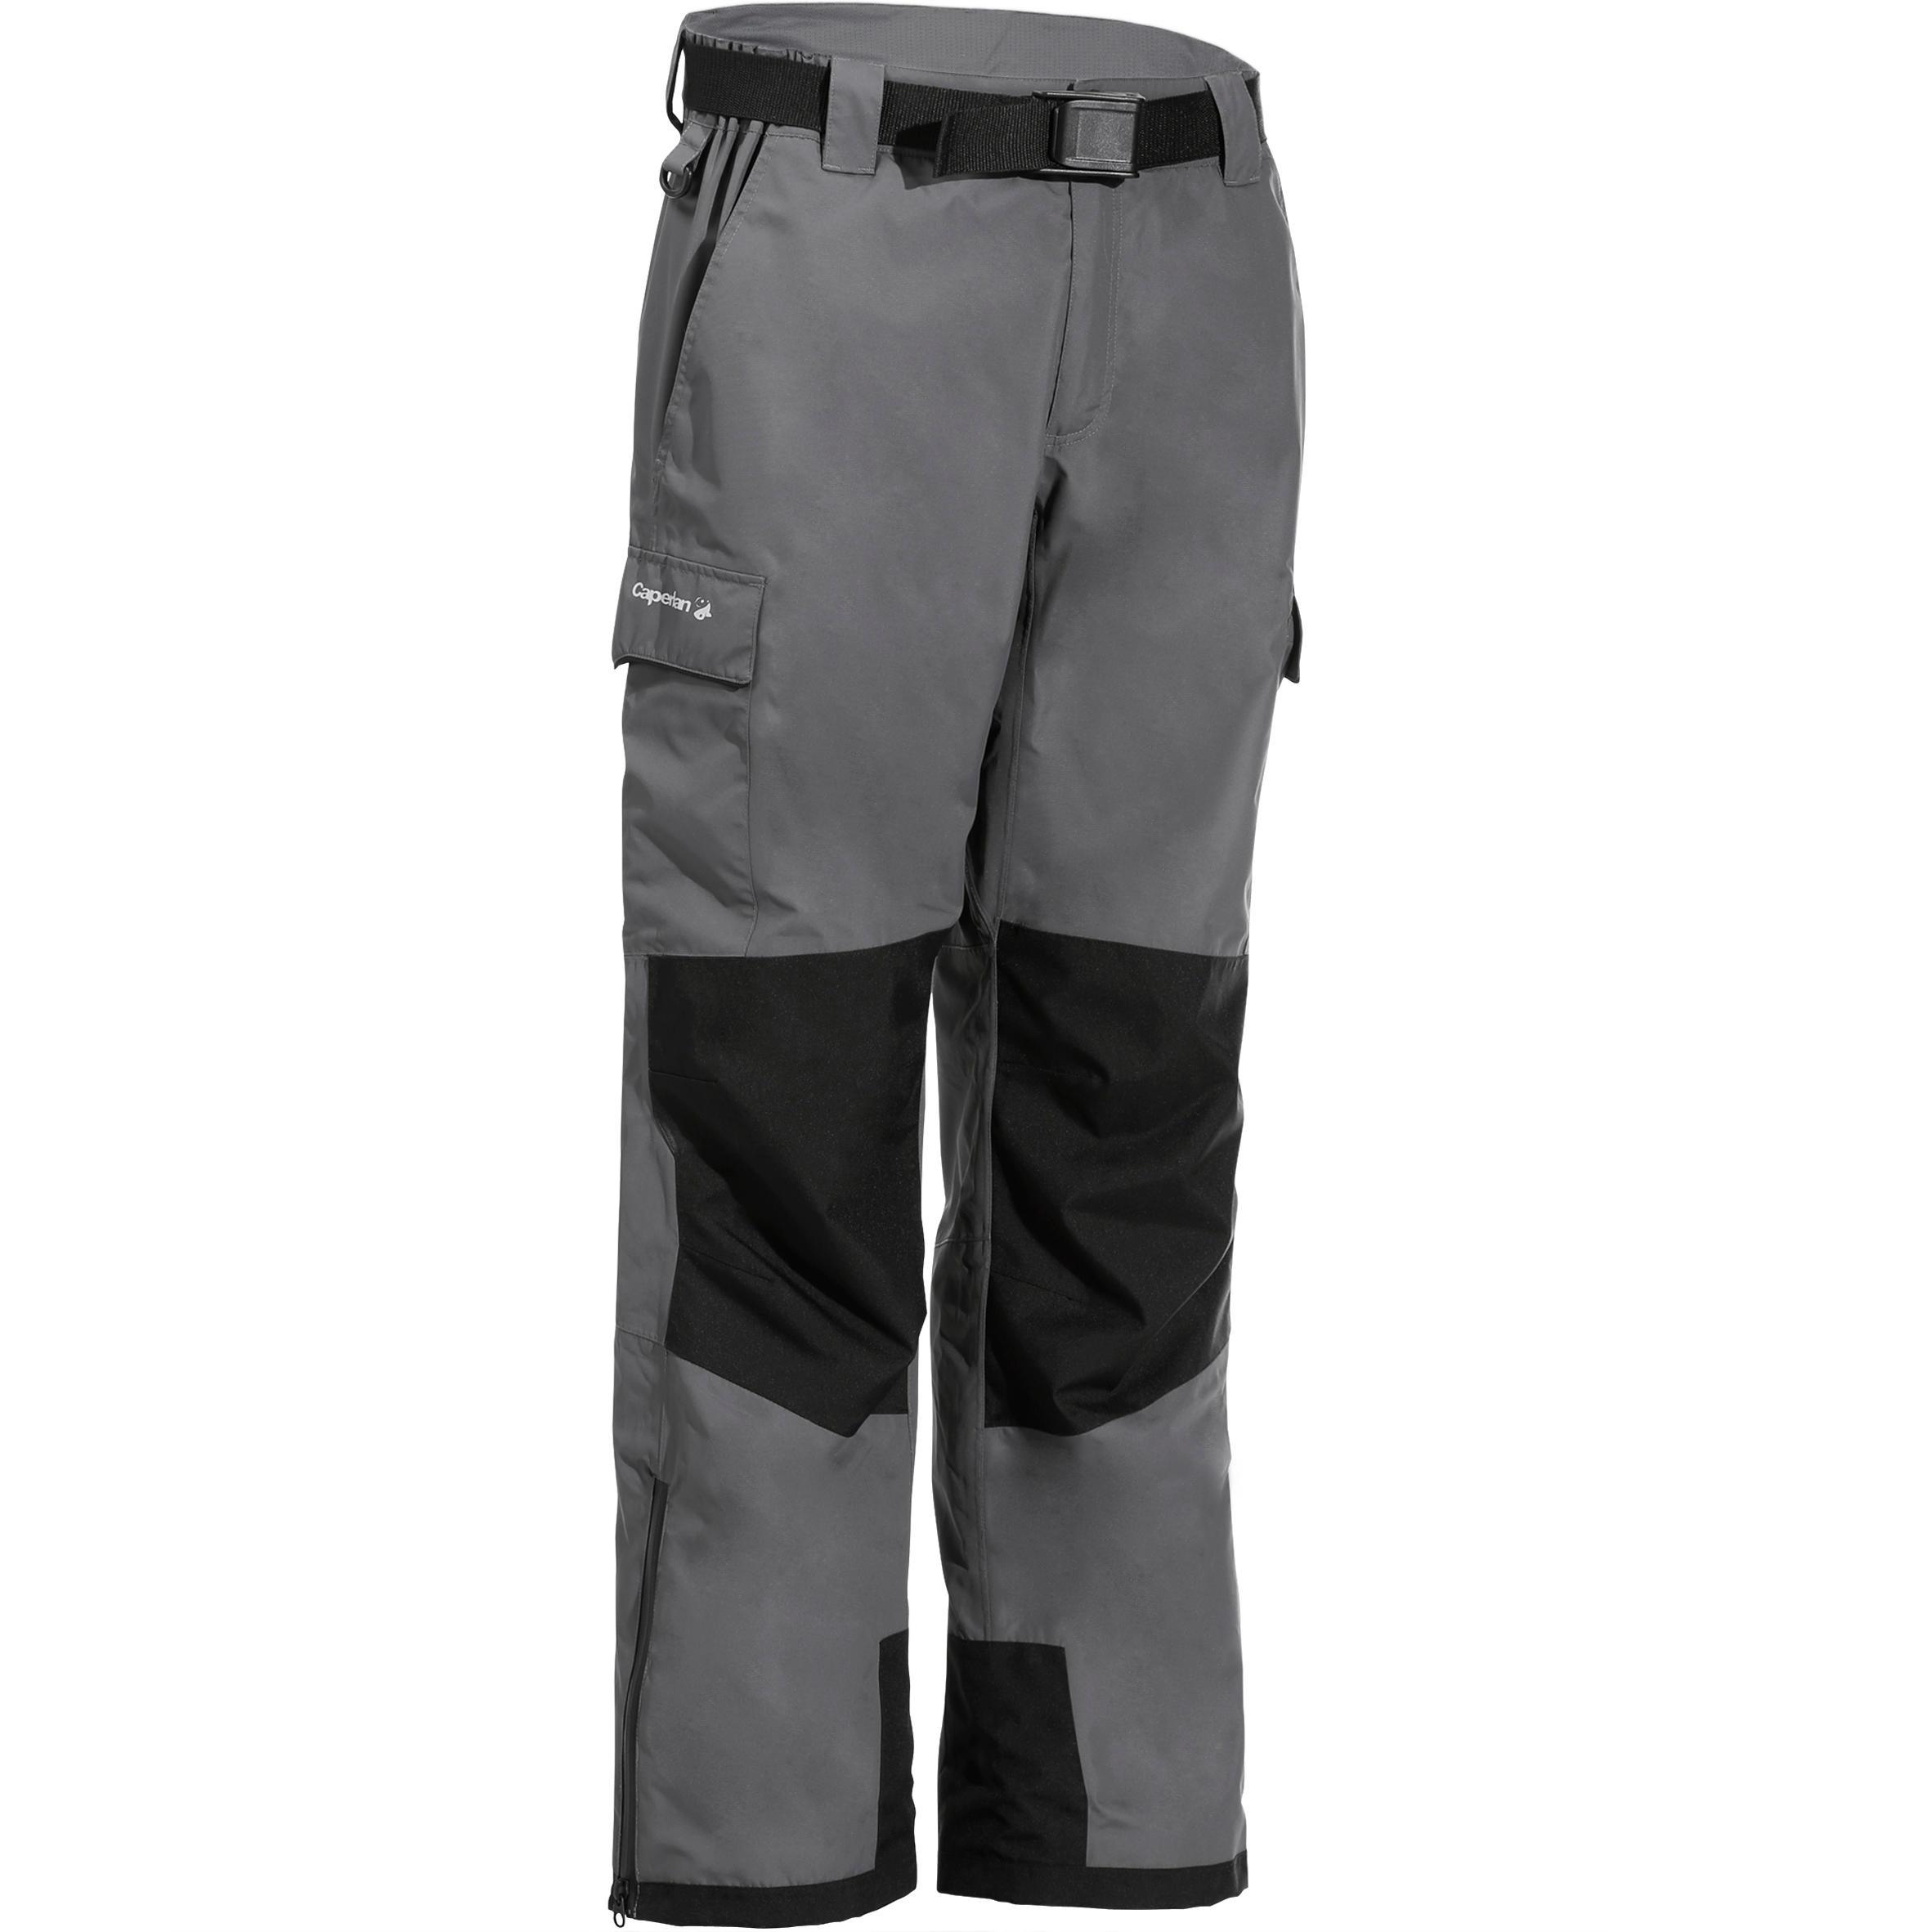 Pantalon Pescuit 500 Gri la Reducere poza